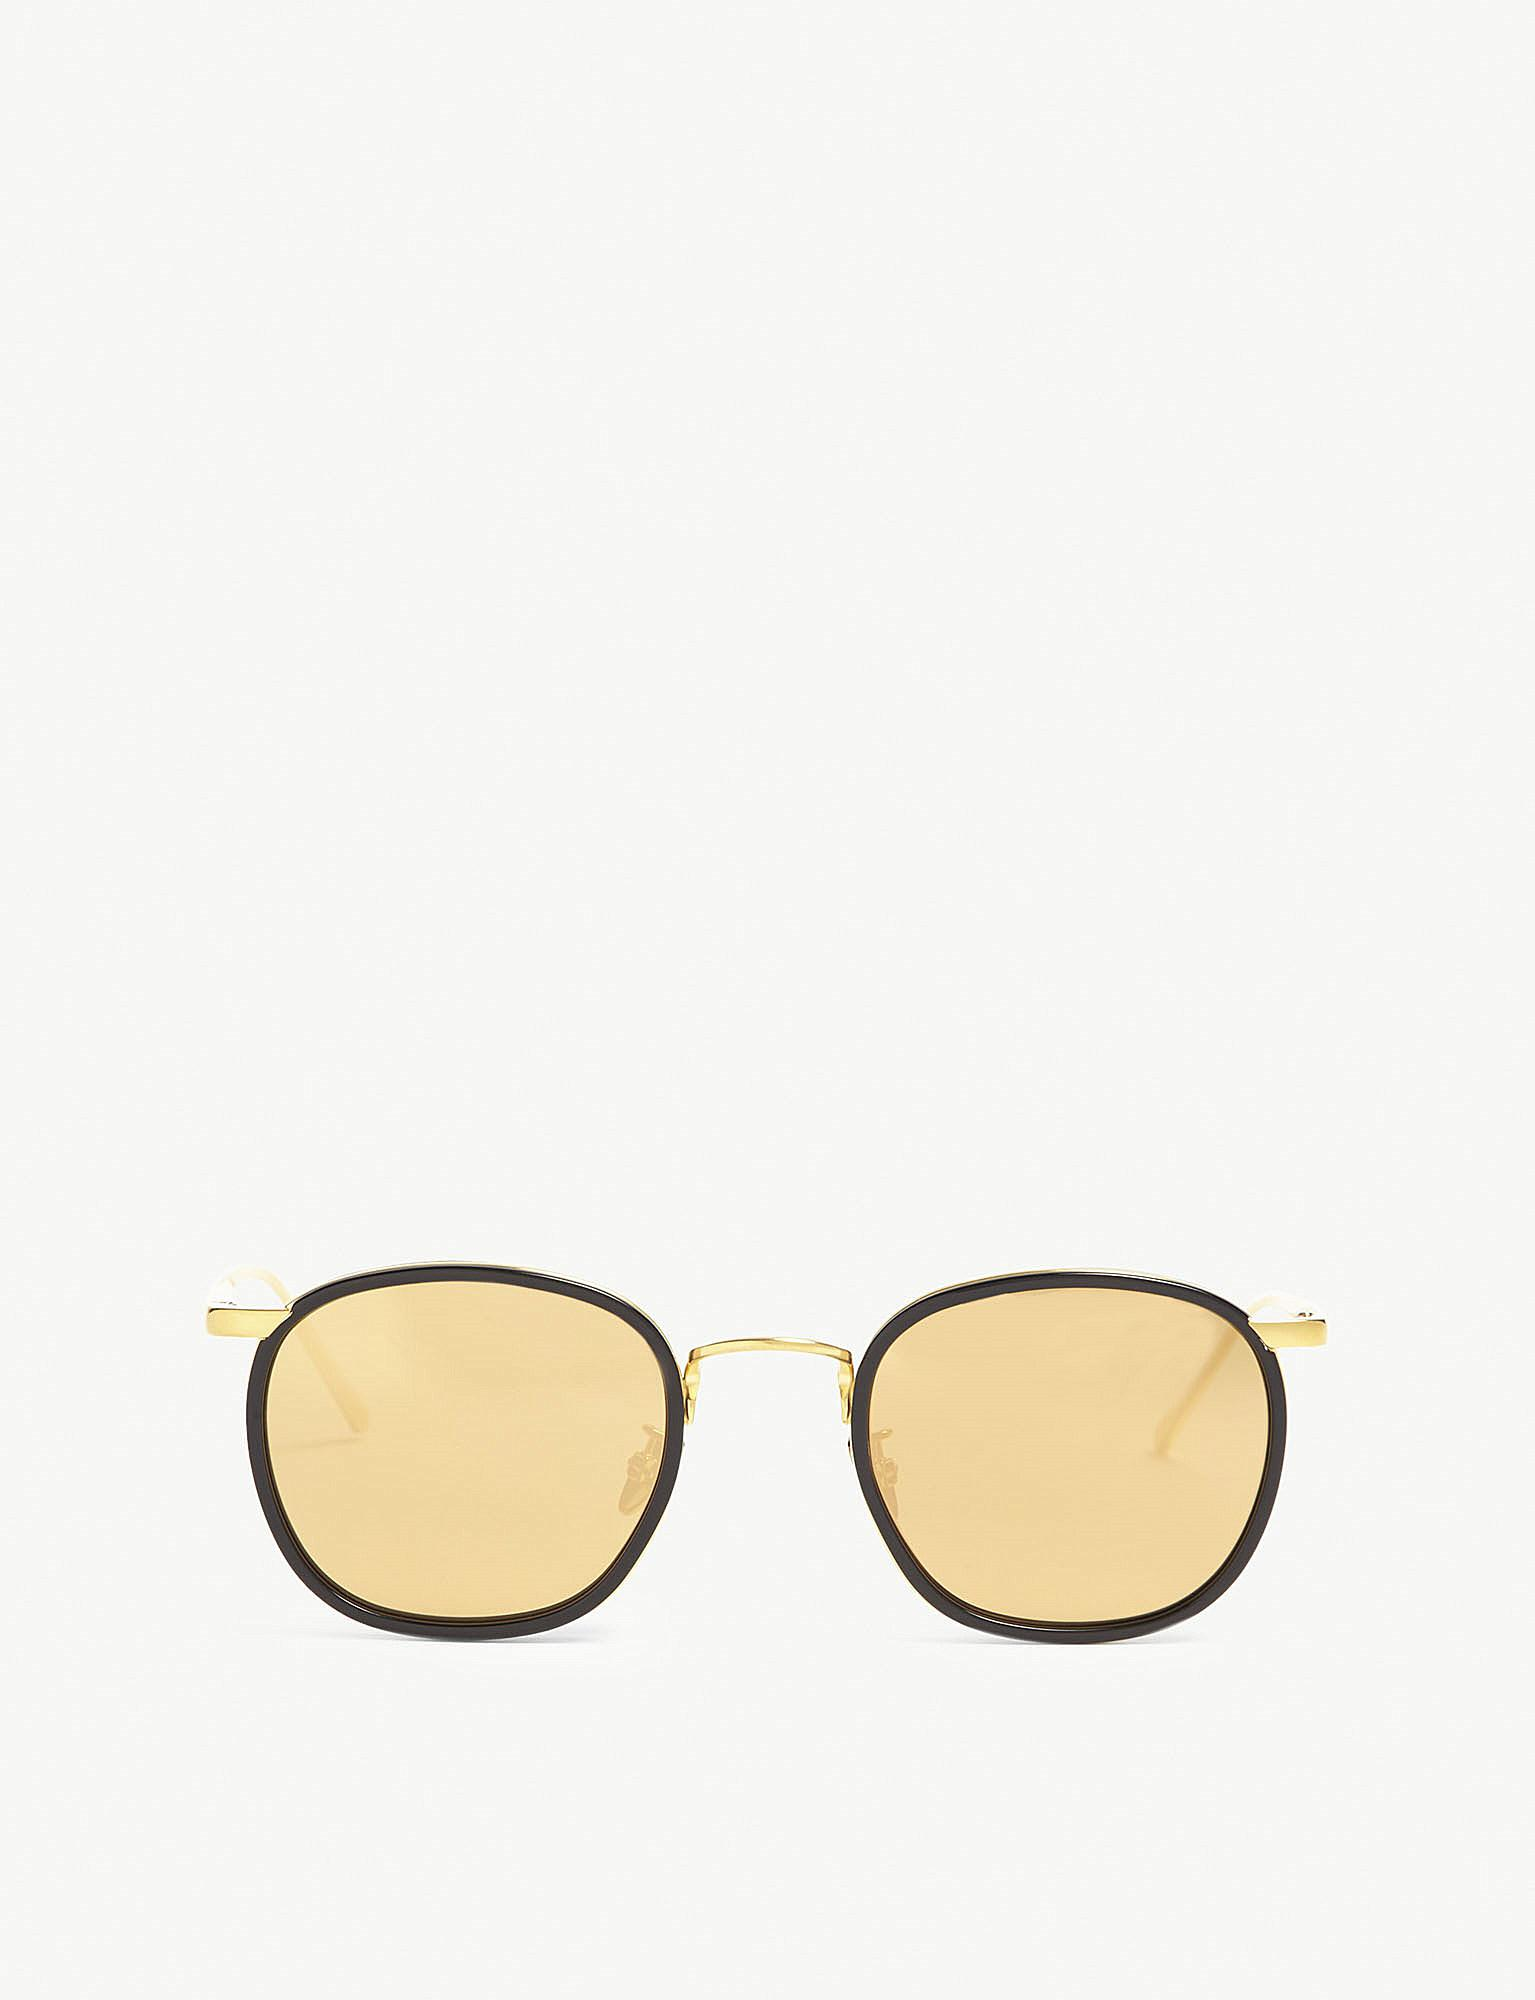 LFL239C43SUN sunglasses Linda Farrow mwDPhAW